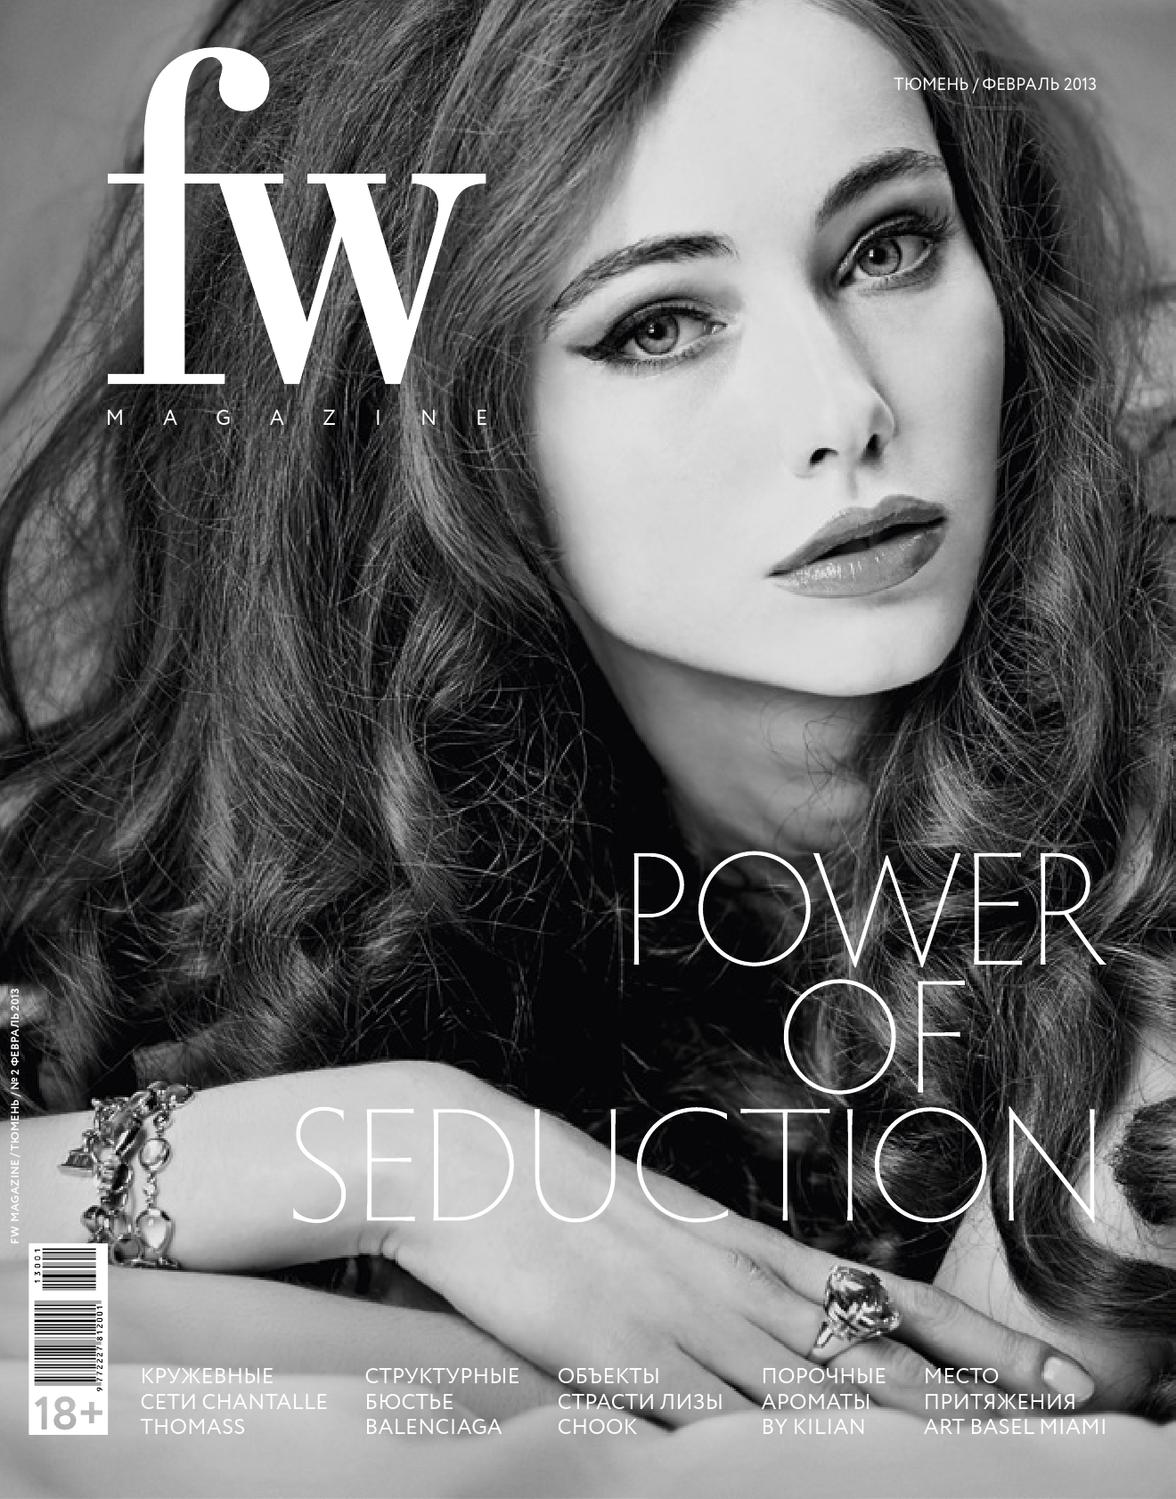 FW Magazine Tyumen №2 by FW Magazine - issuu c697c2b286c